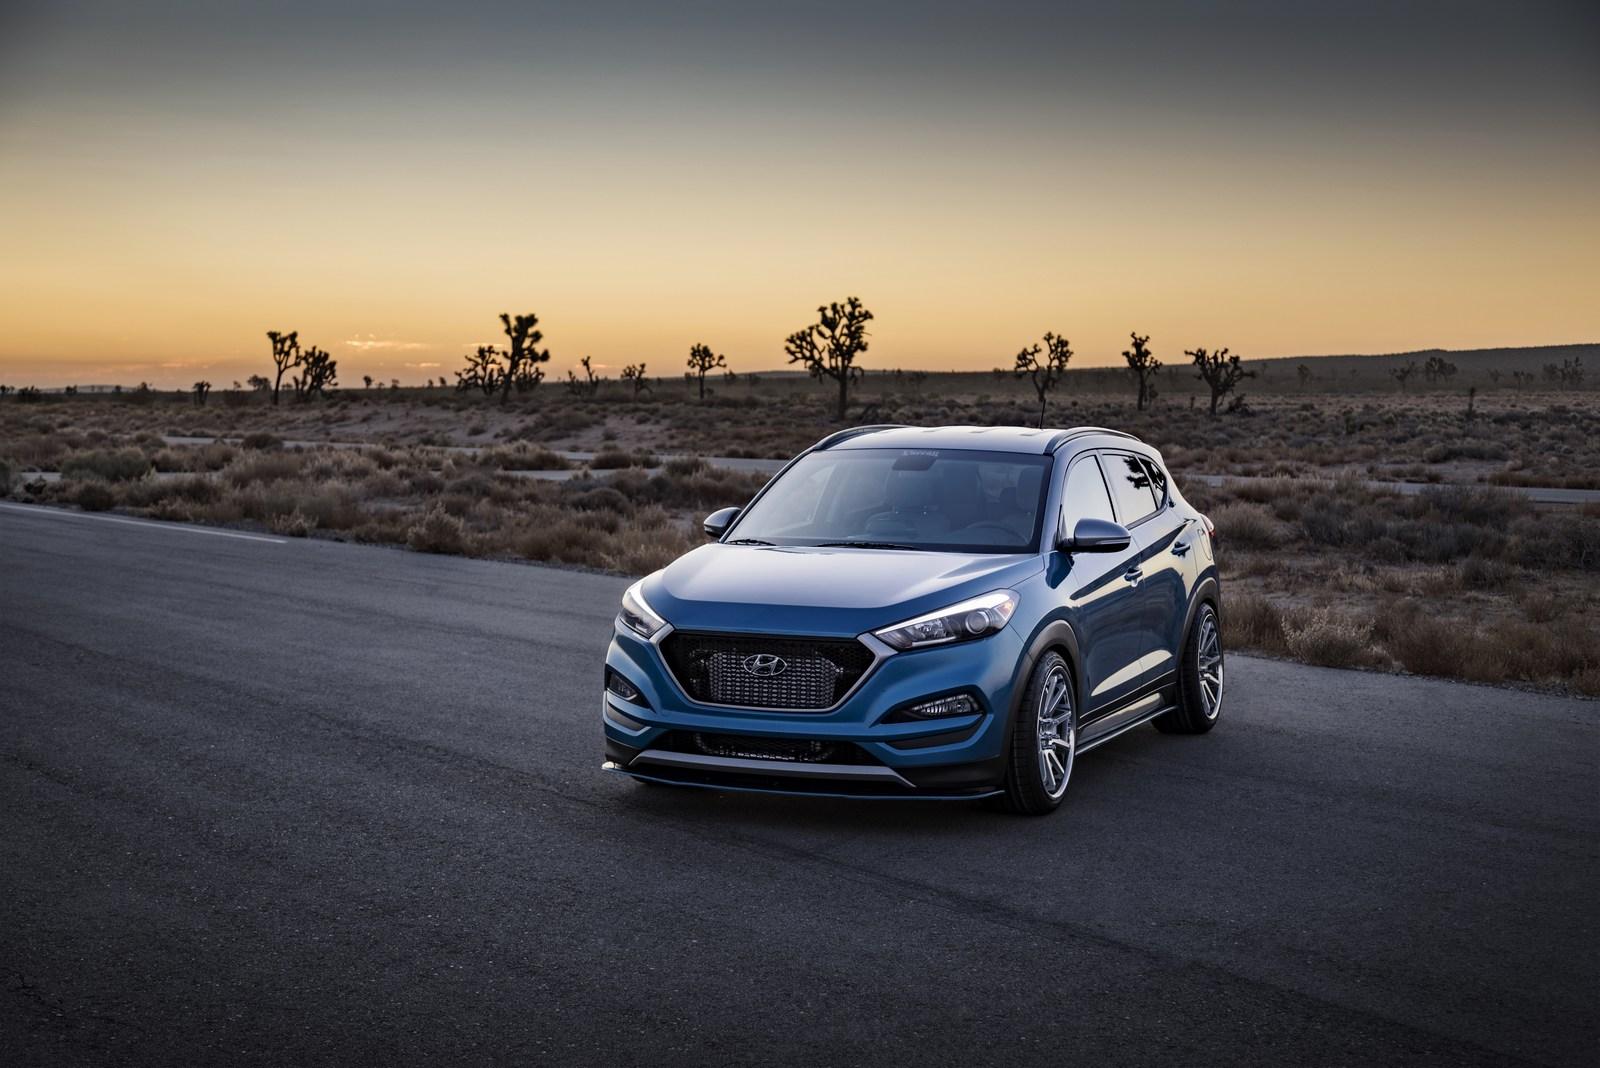 Hyundai-Vaccar-Tucson-Sport-Concept-2